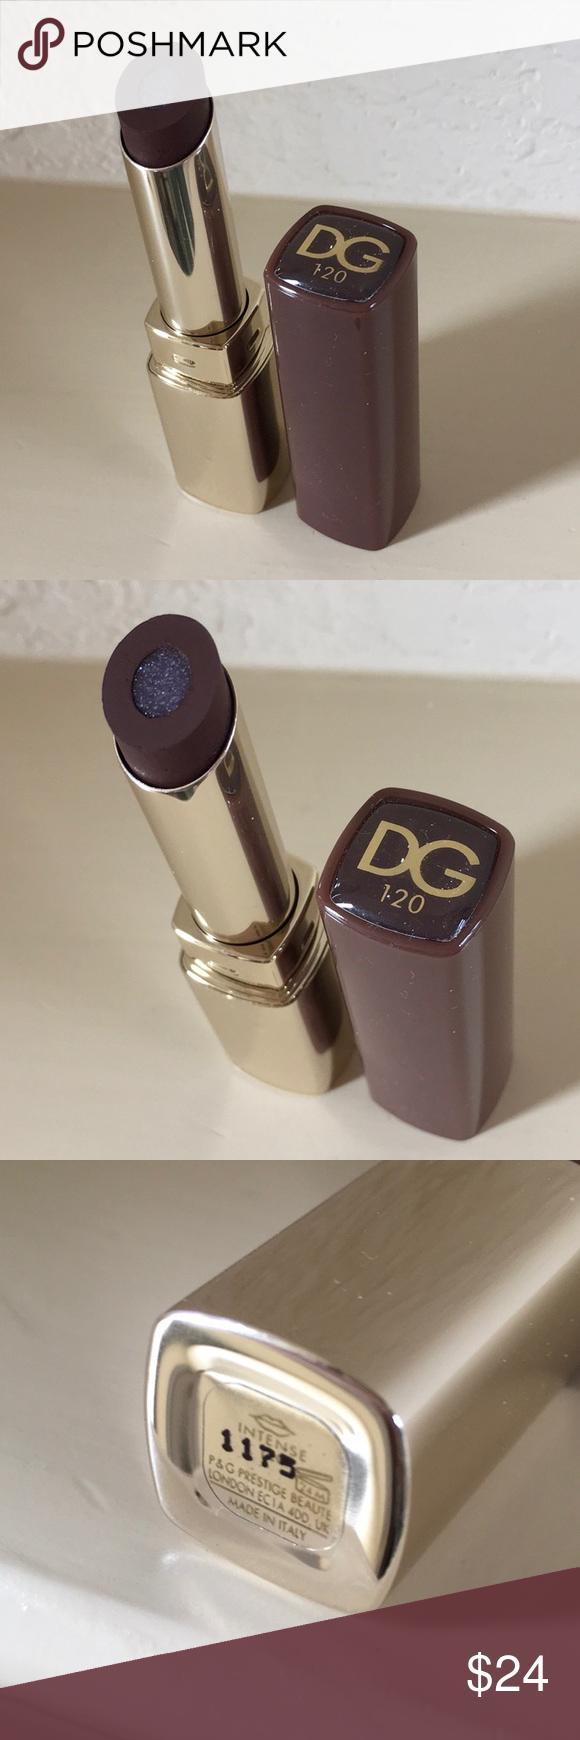 1f5273c2 🙀Dolce & Gabbana Passion Duo Lipstick Intense 120 Brand new in tester  box.